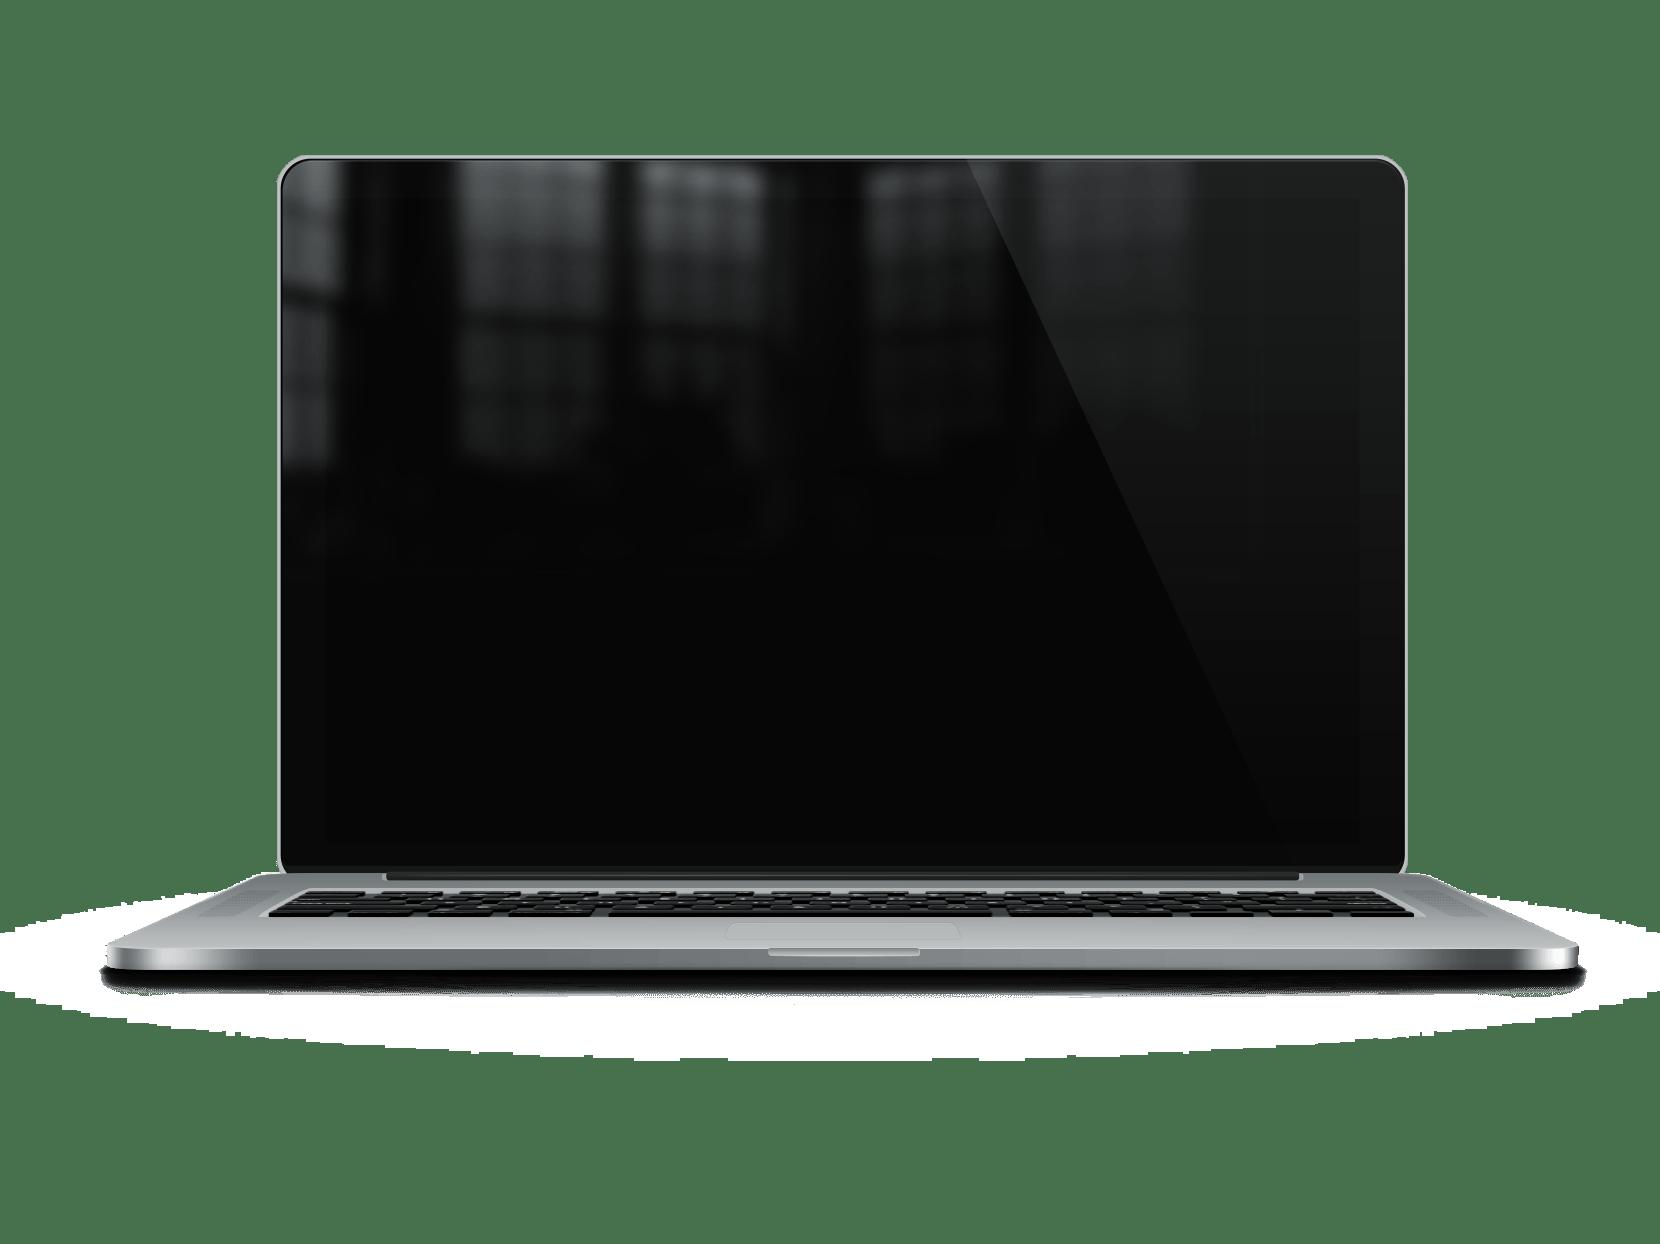 Glossy Macbook Pro Retina Mockup PSD Download Download PSD